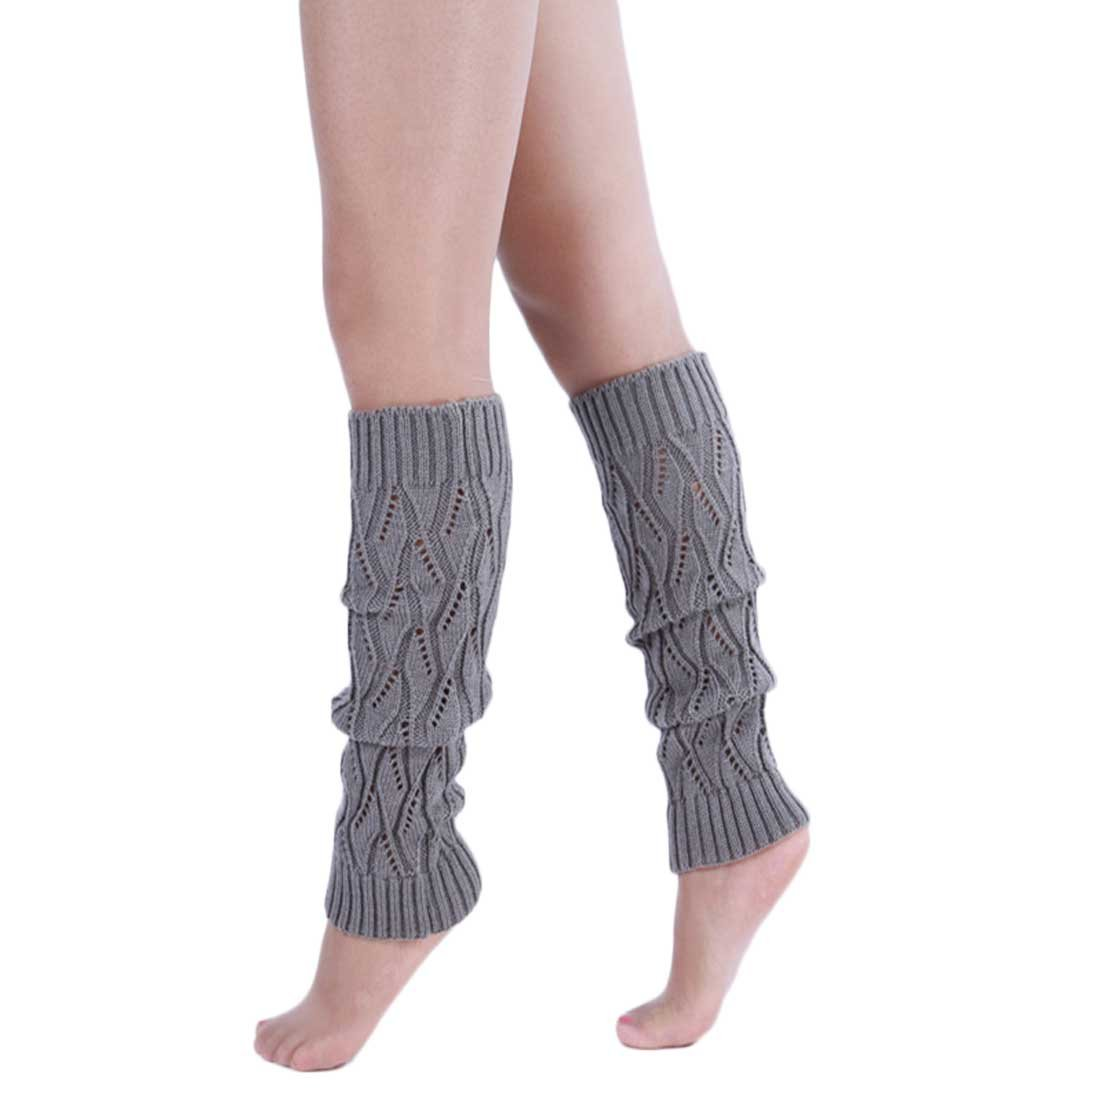 VoberryWomen Knitting Wool High Kneen Socks Leg Warmers Leisure Boot Socks (D)